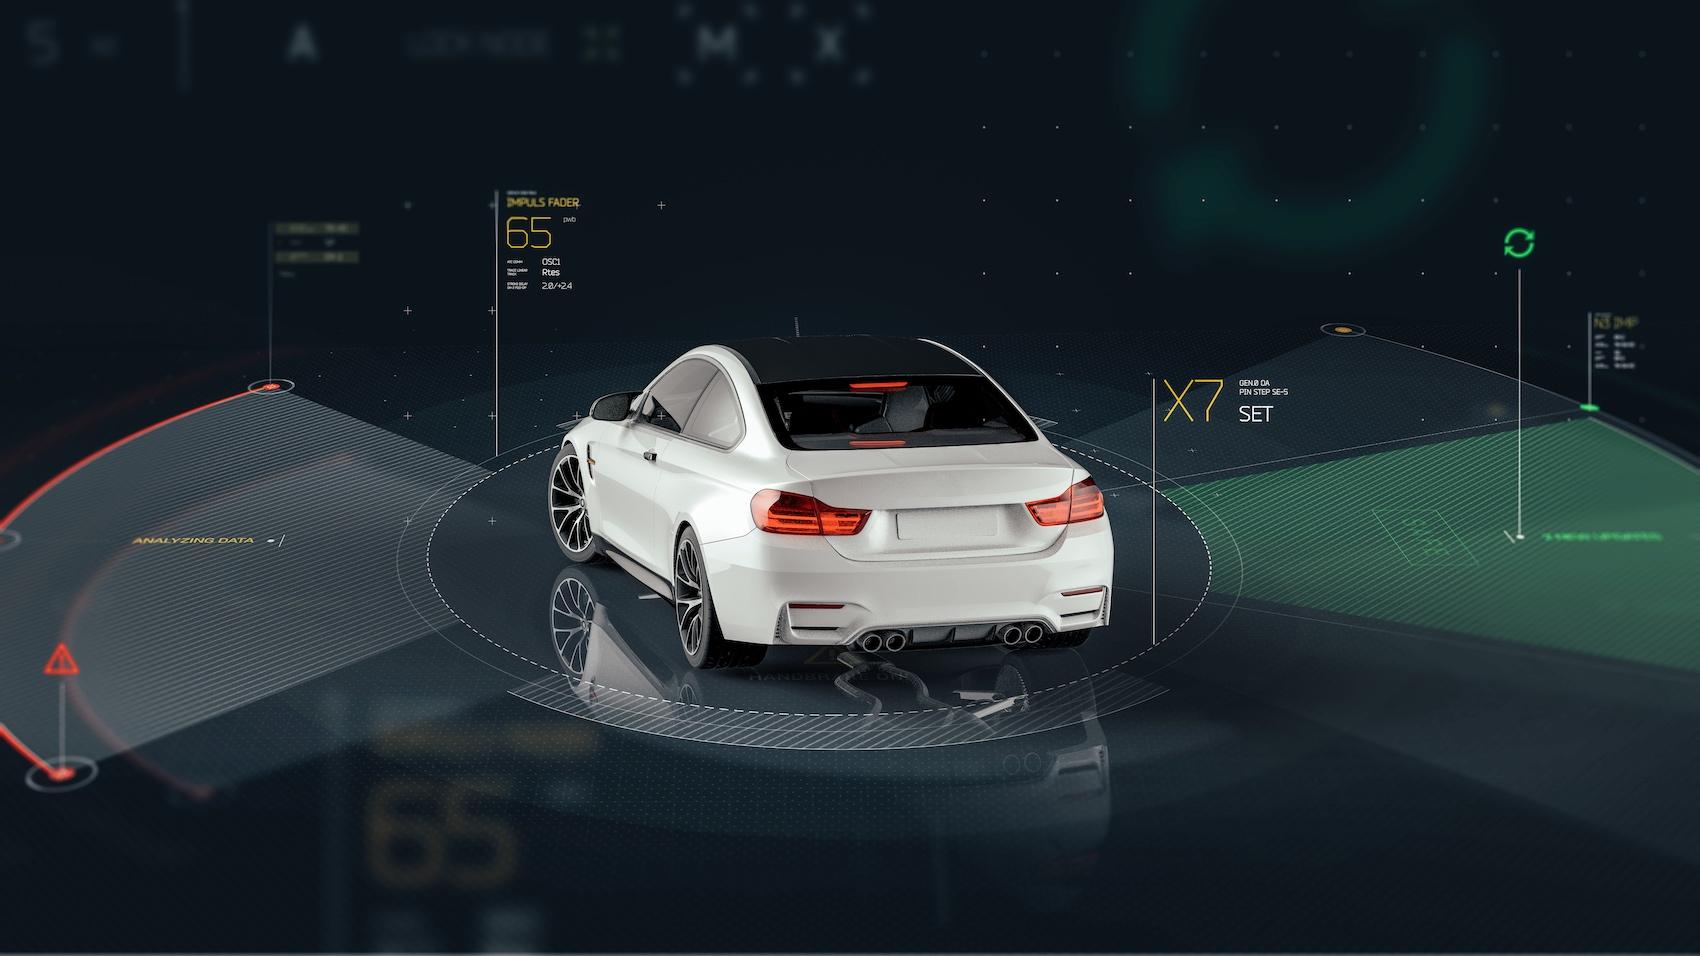 Big Data: Driving Change in Smart Vehicle Architecture TechNative